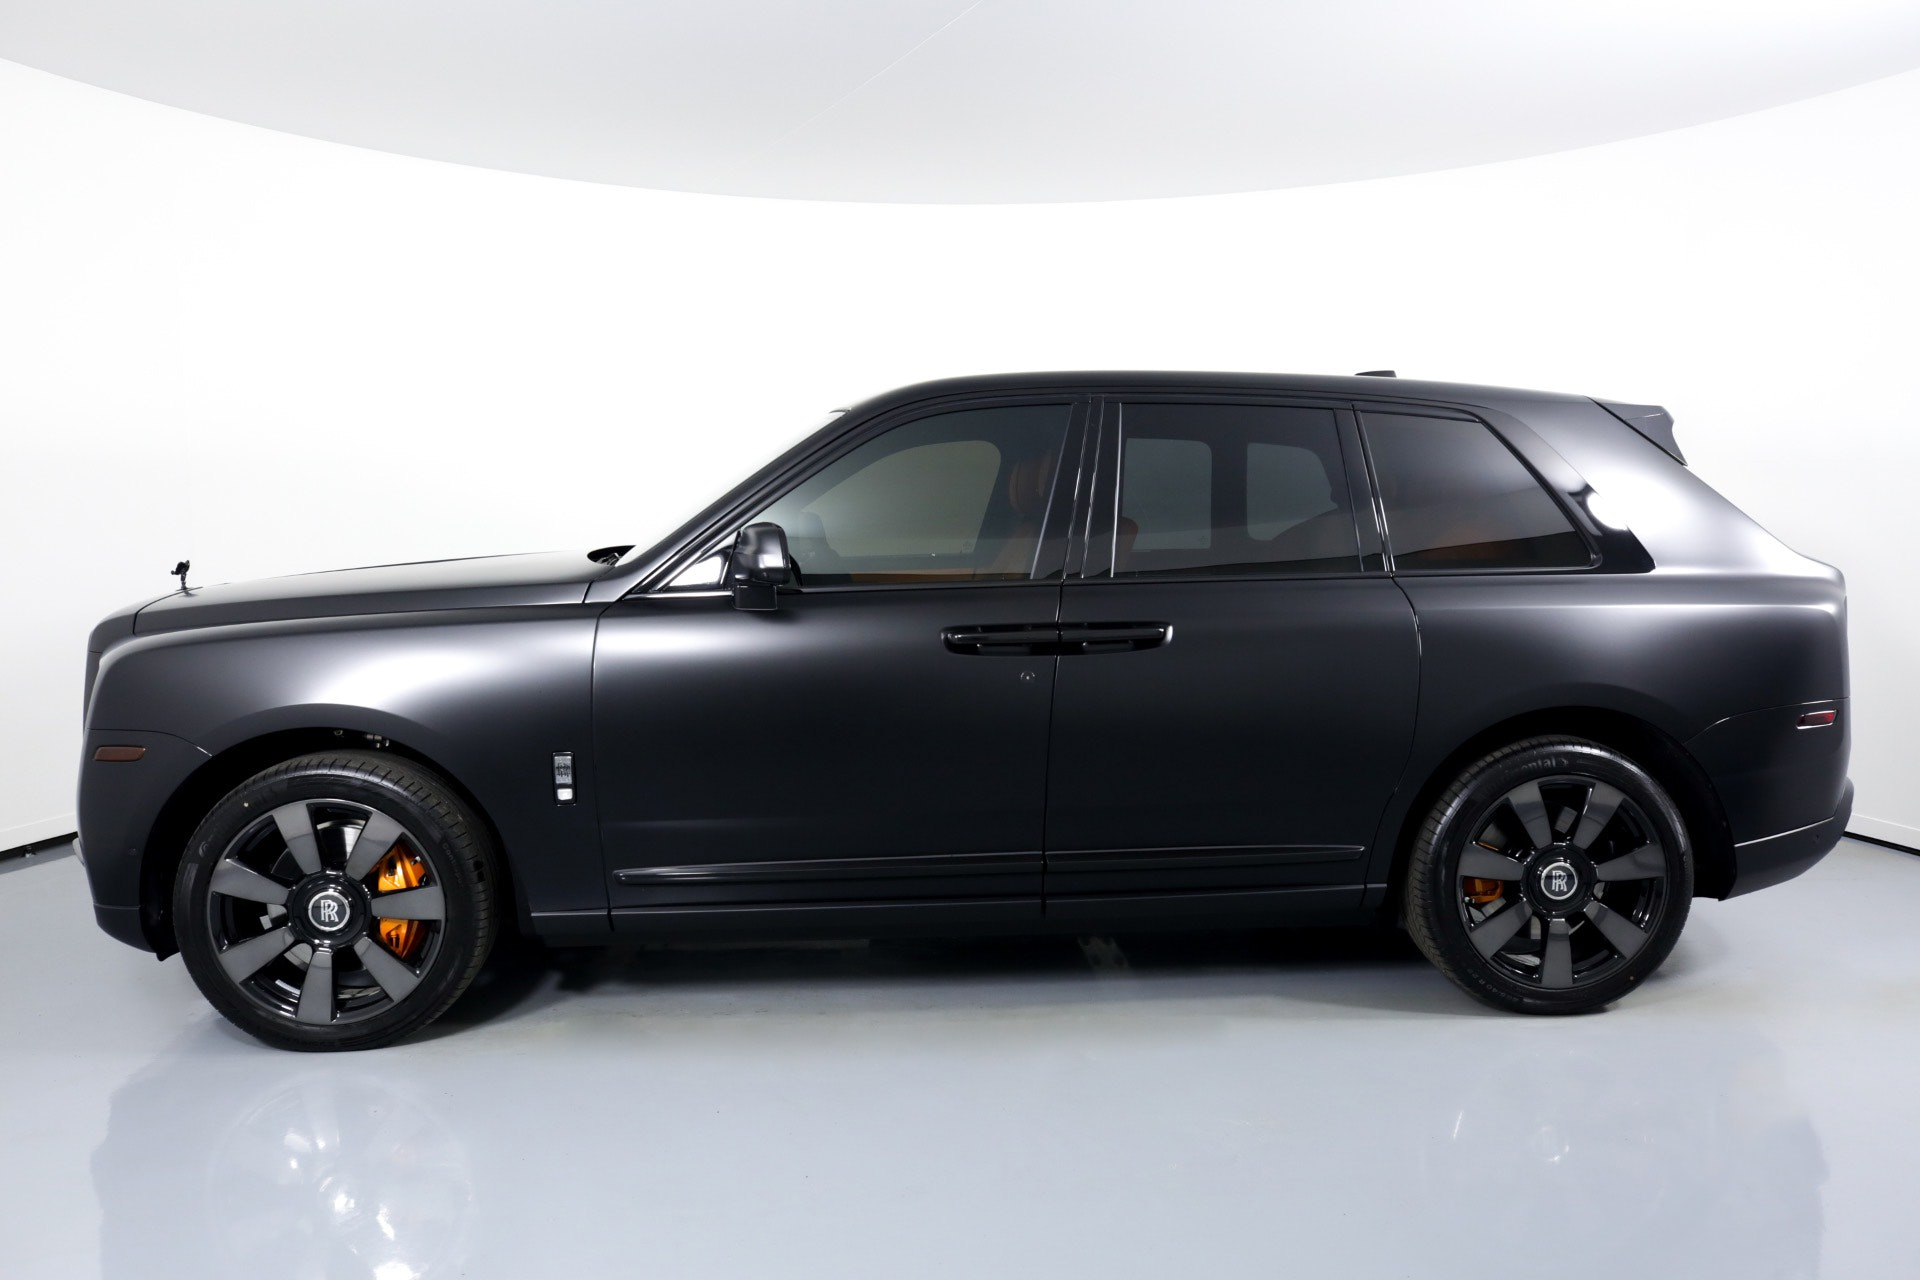 Miami 2020 Rolls Royce Cullinan image #2